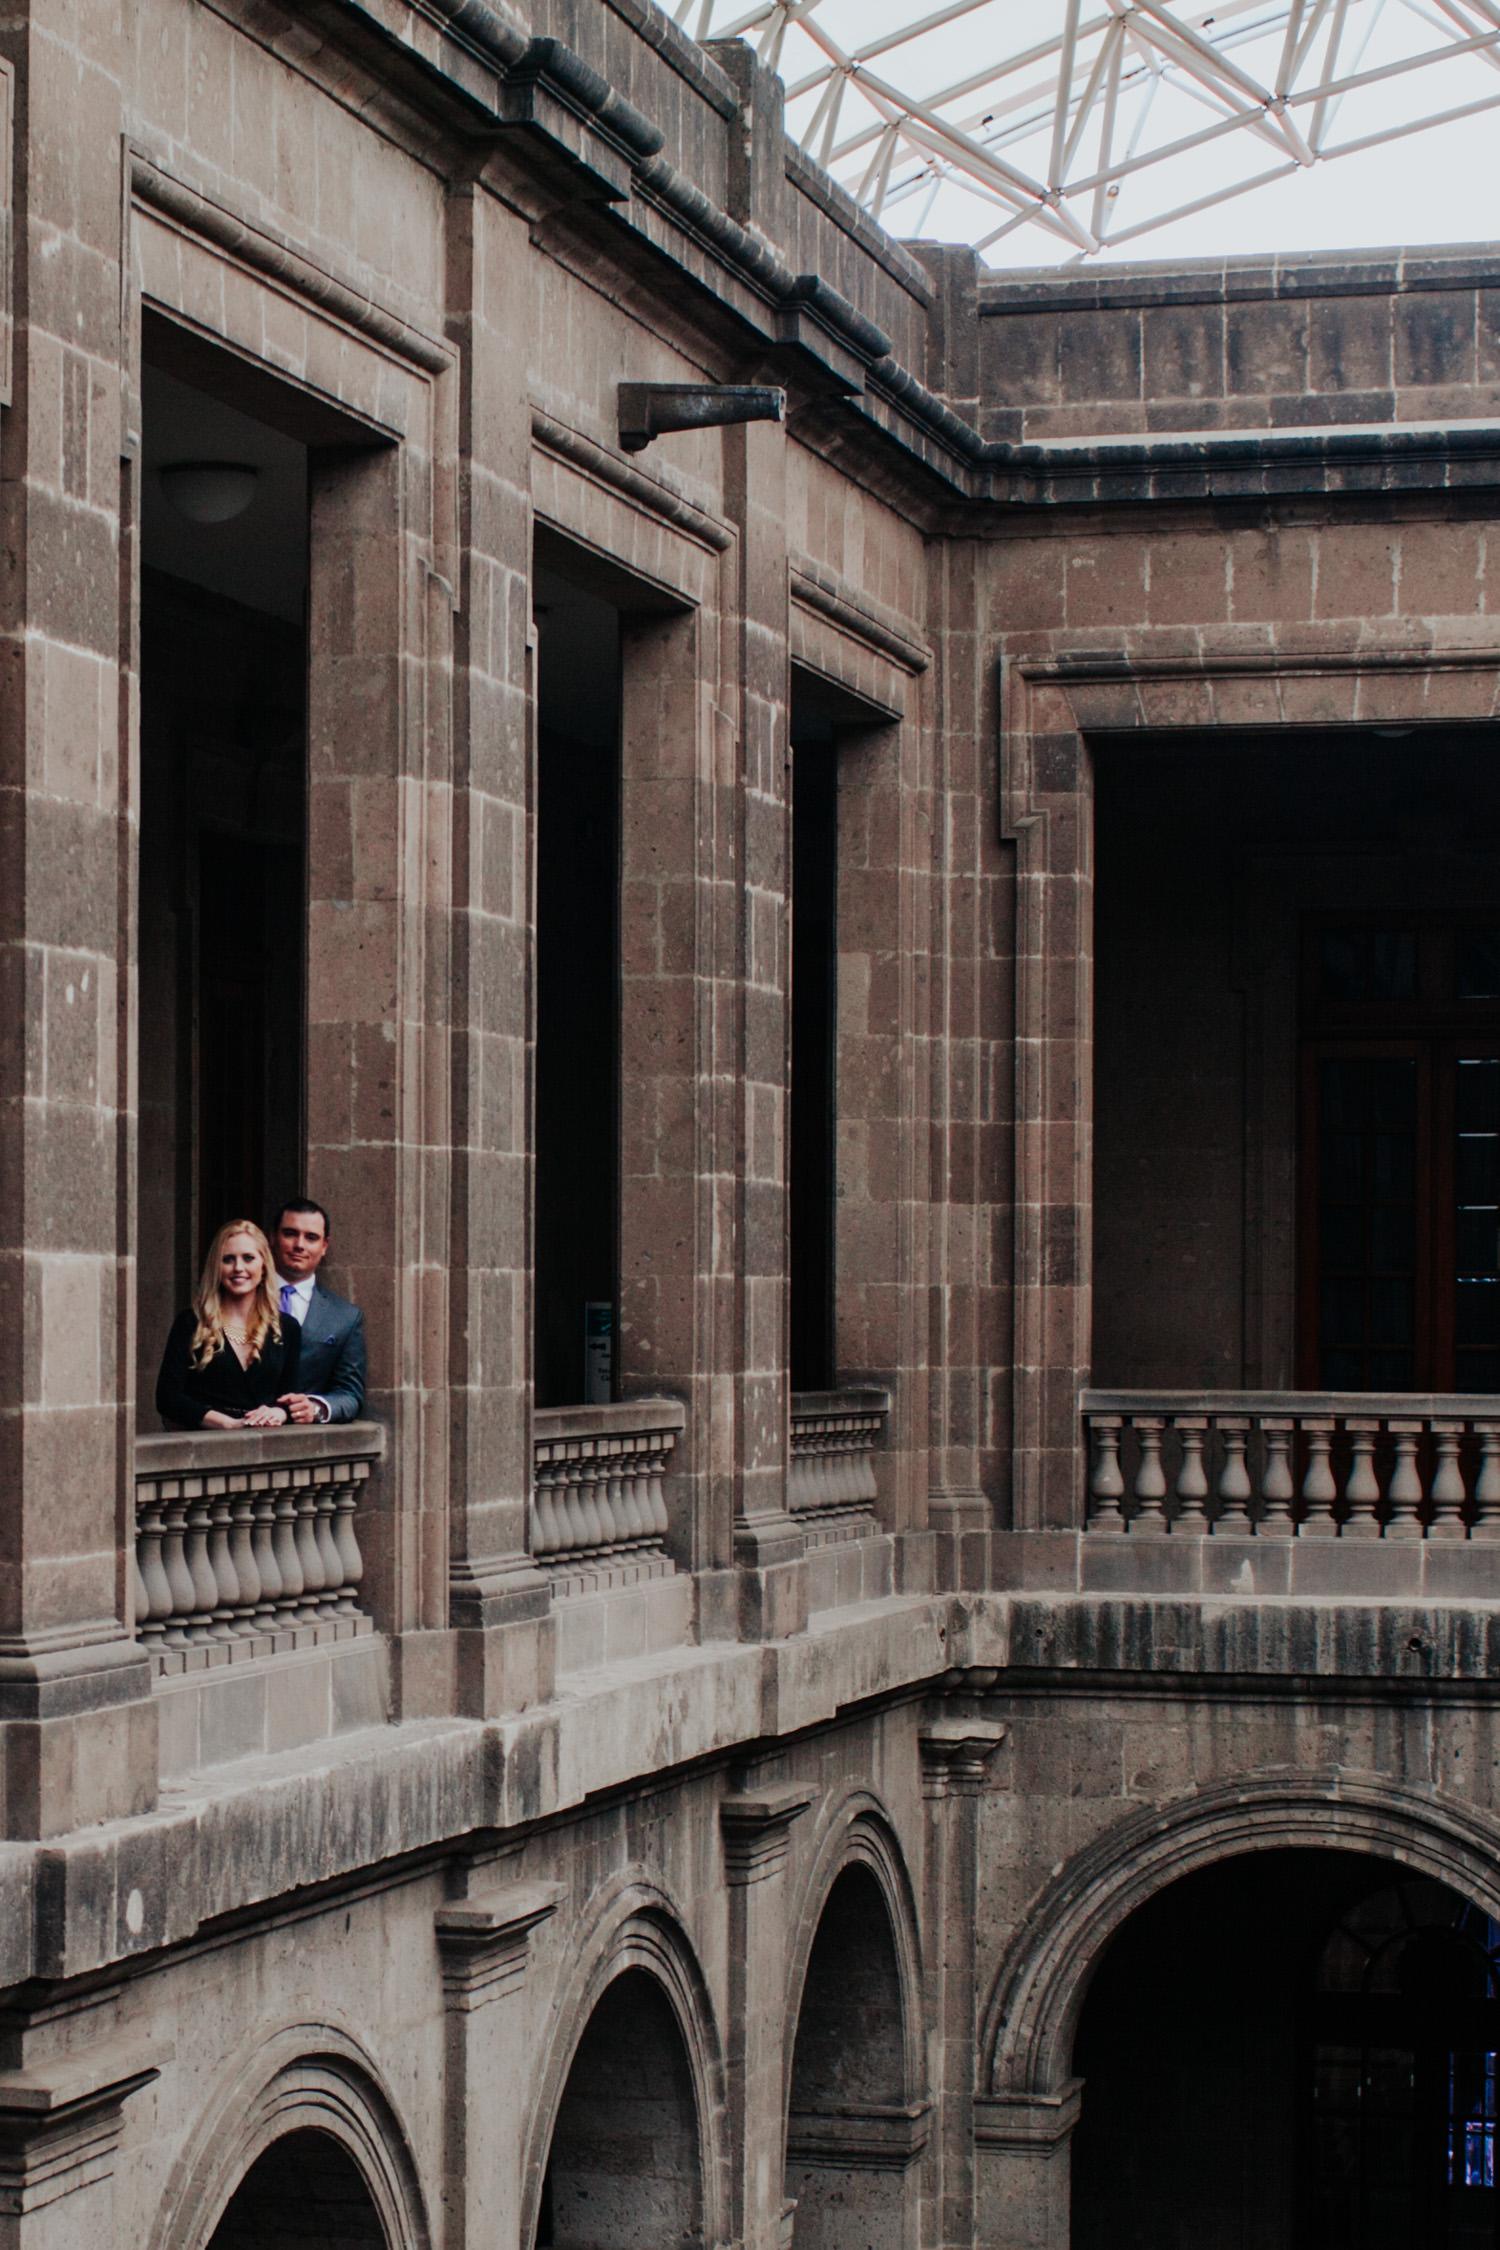 fotografo-mexico-df-boda-wedding-jw-marriot-hotel-polanco-chapultepec-pierce-78.jpg